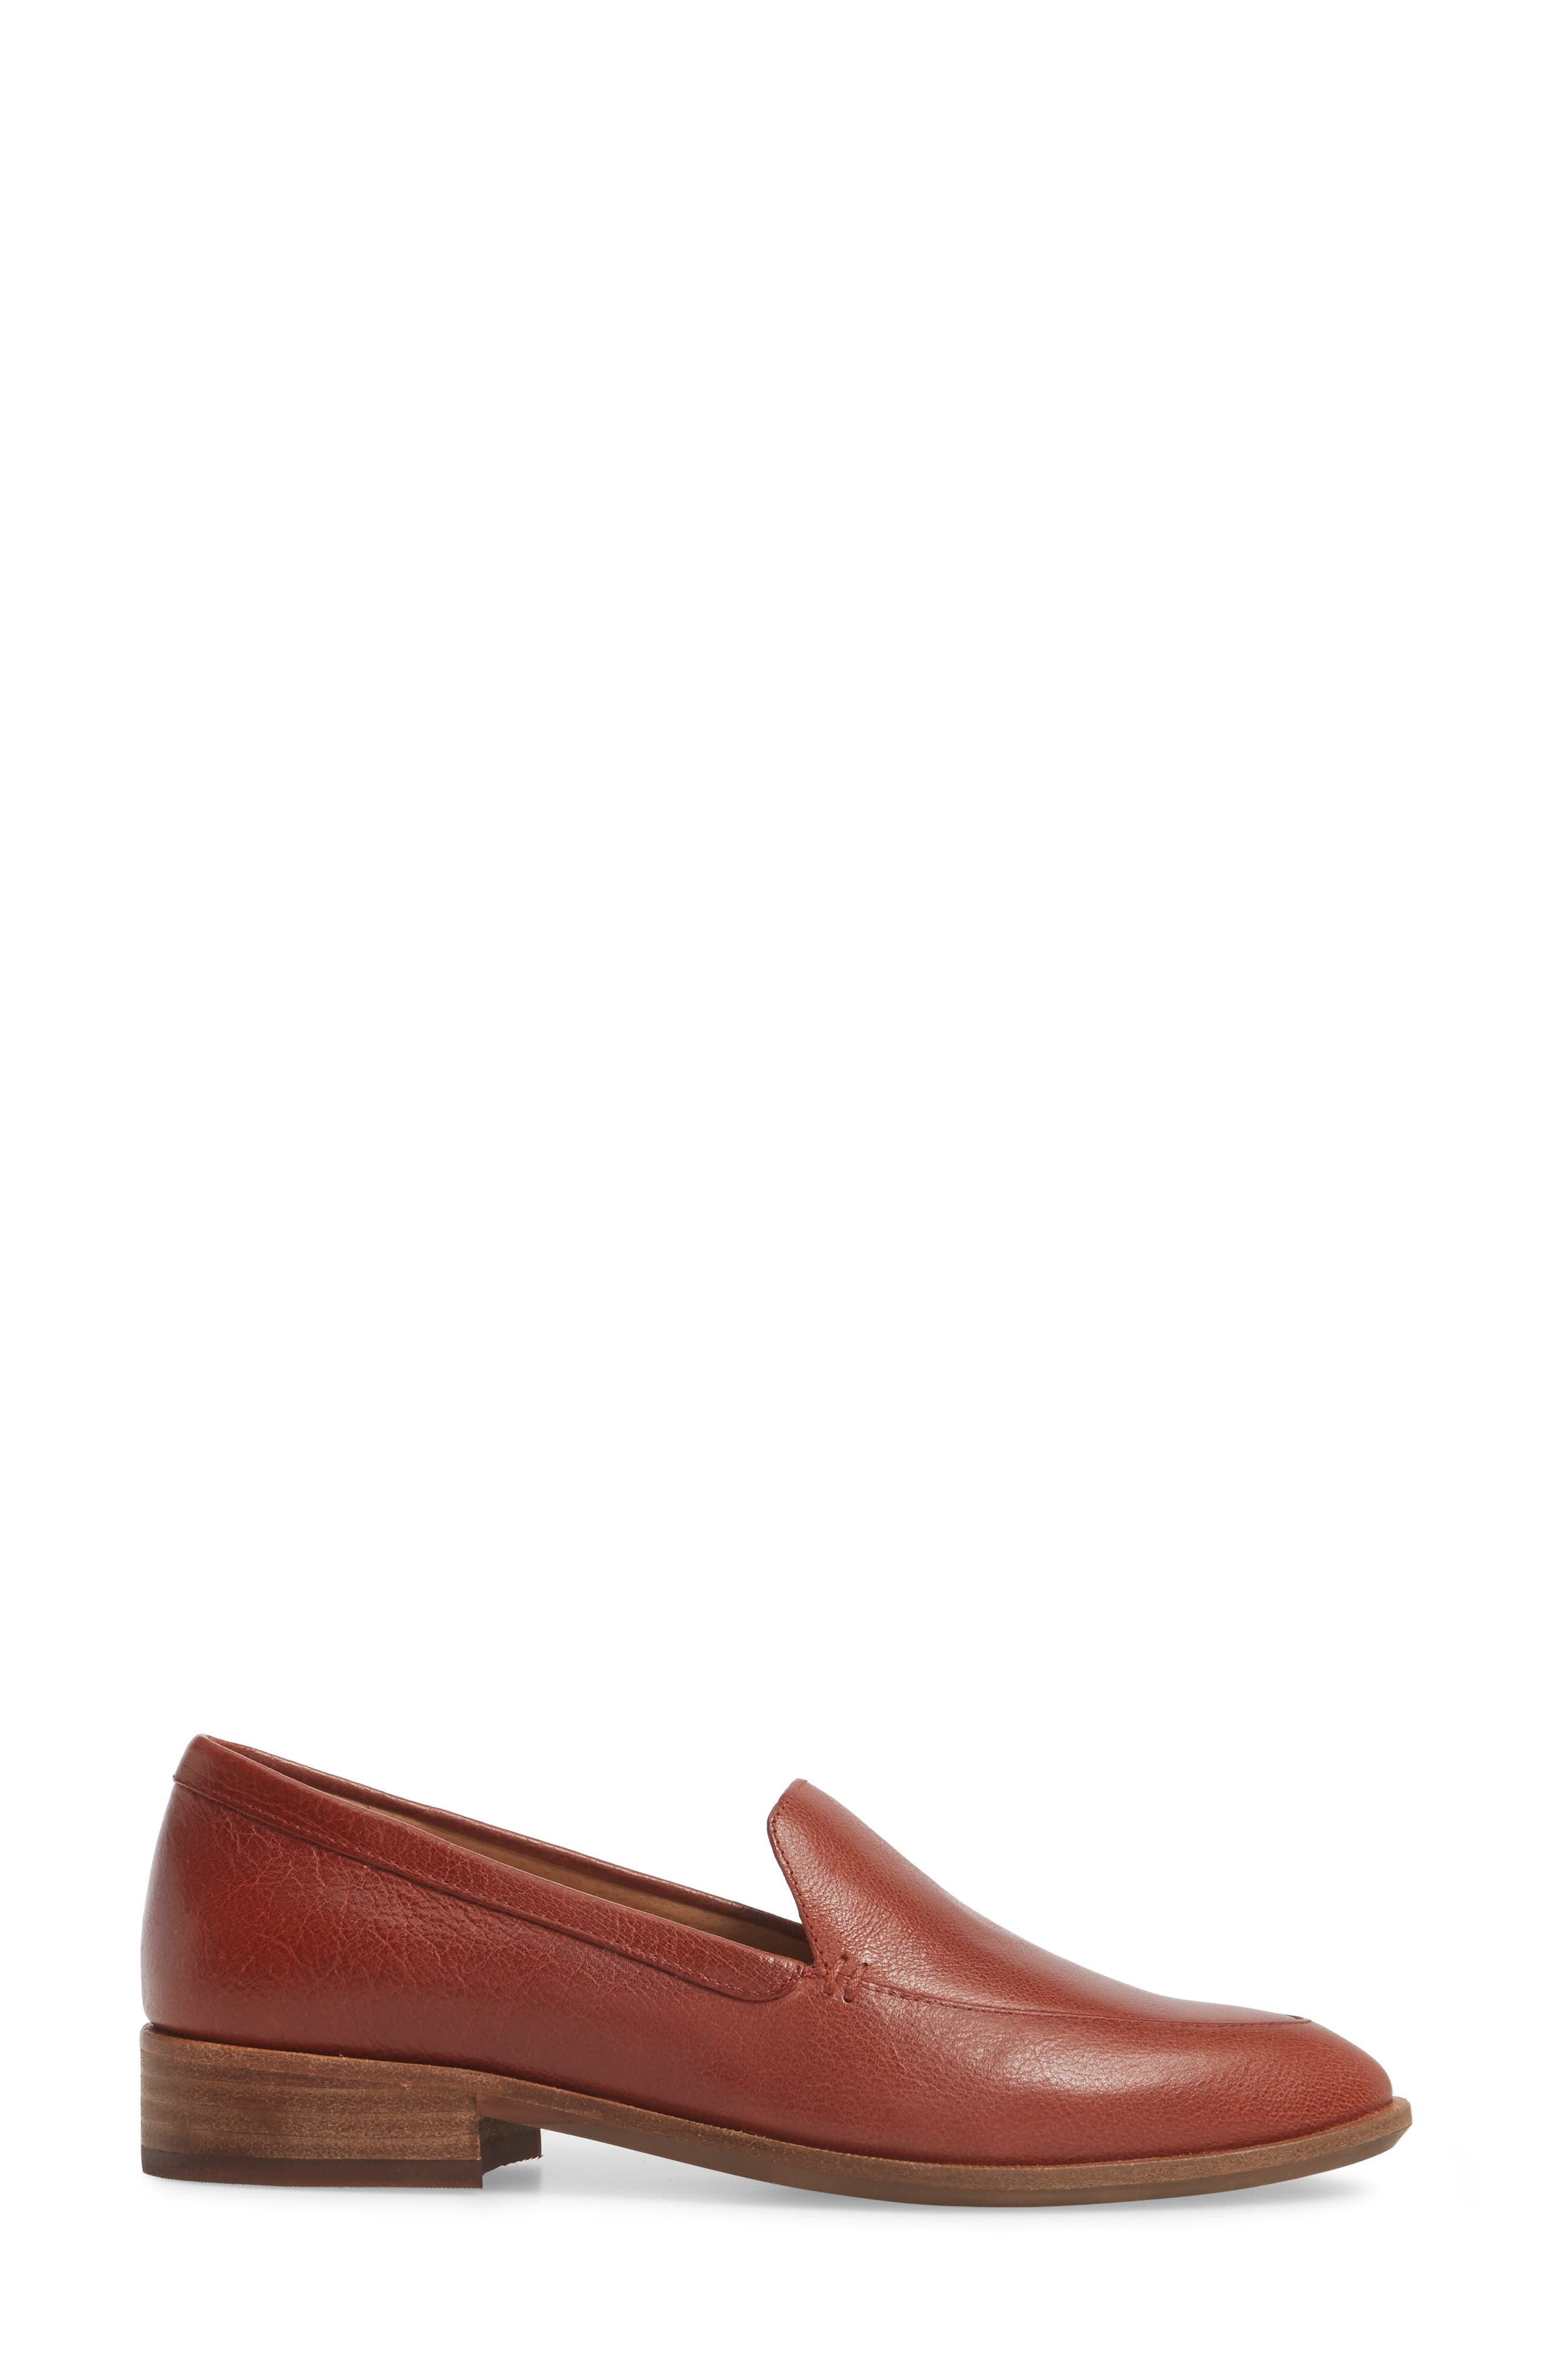 Frances Loafer,                             Alternate thumbnail 3, color,                             Burnished Mahogany Leather